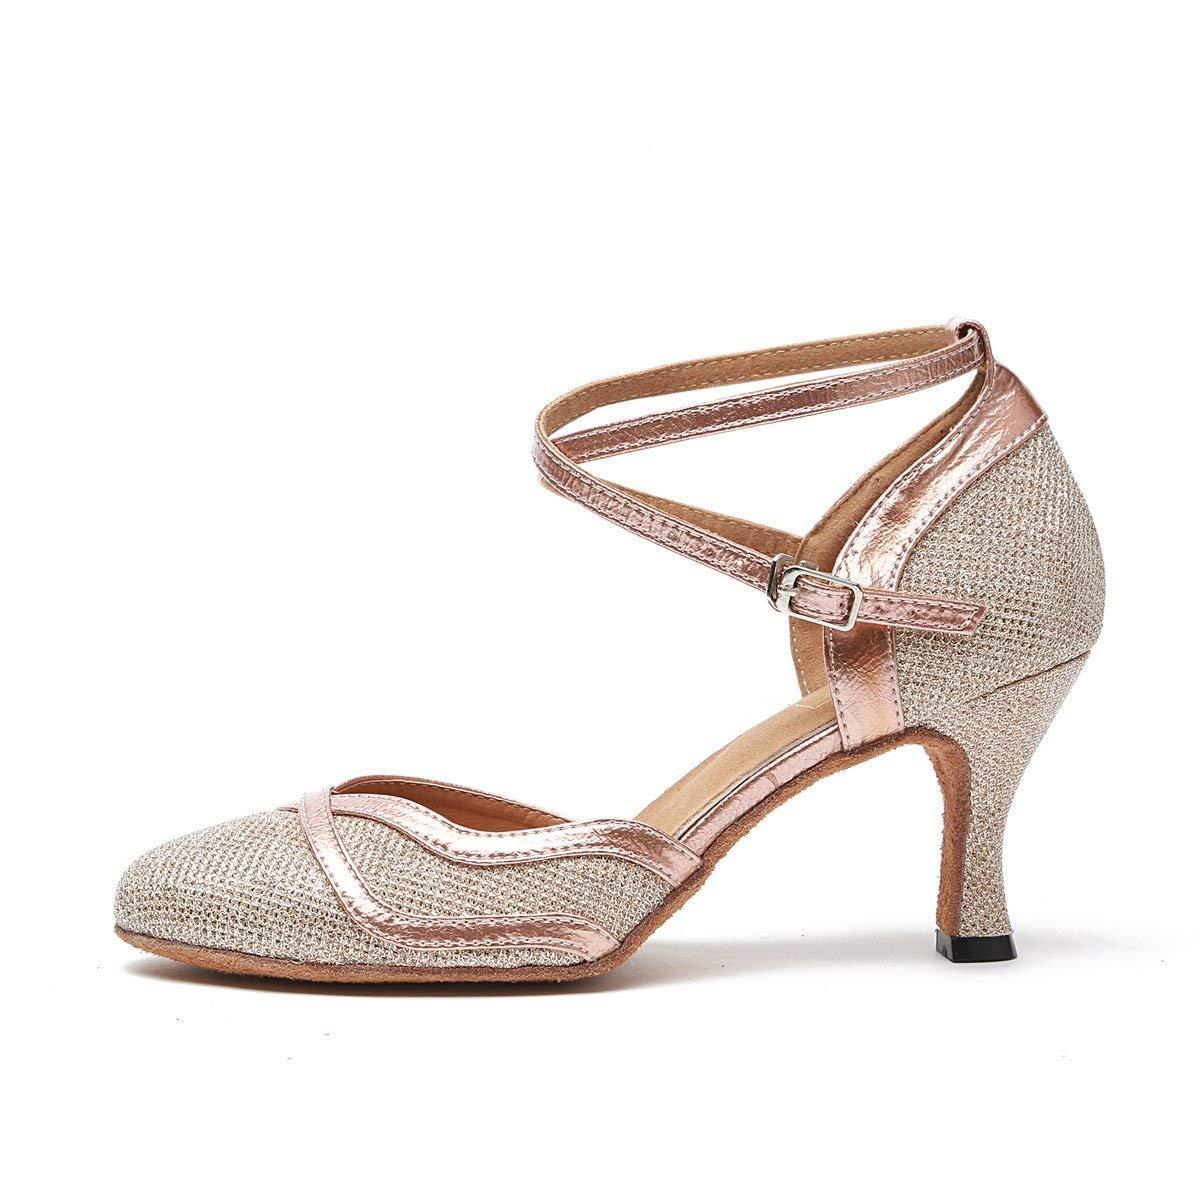 Qiusa Frauen Glitter Glitter Glitter Ballroom Latin Tanzschuhe Party Hochzeit Heels (Farbe   Champagne-7.5cm Heel Größe   4 UK) d5dfdc